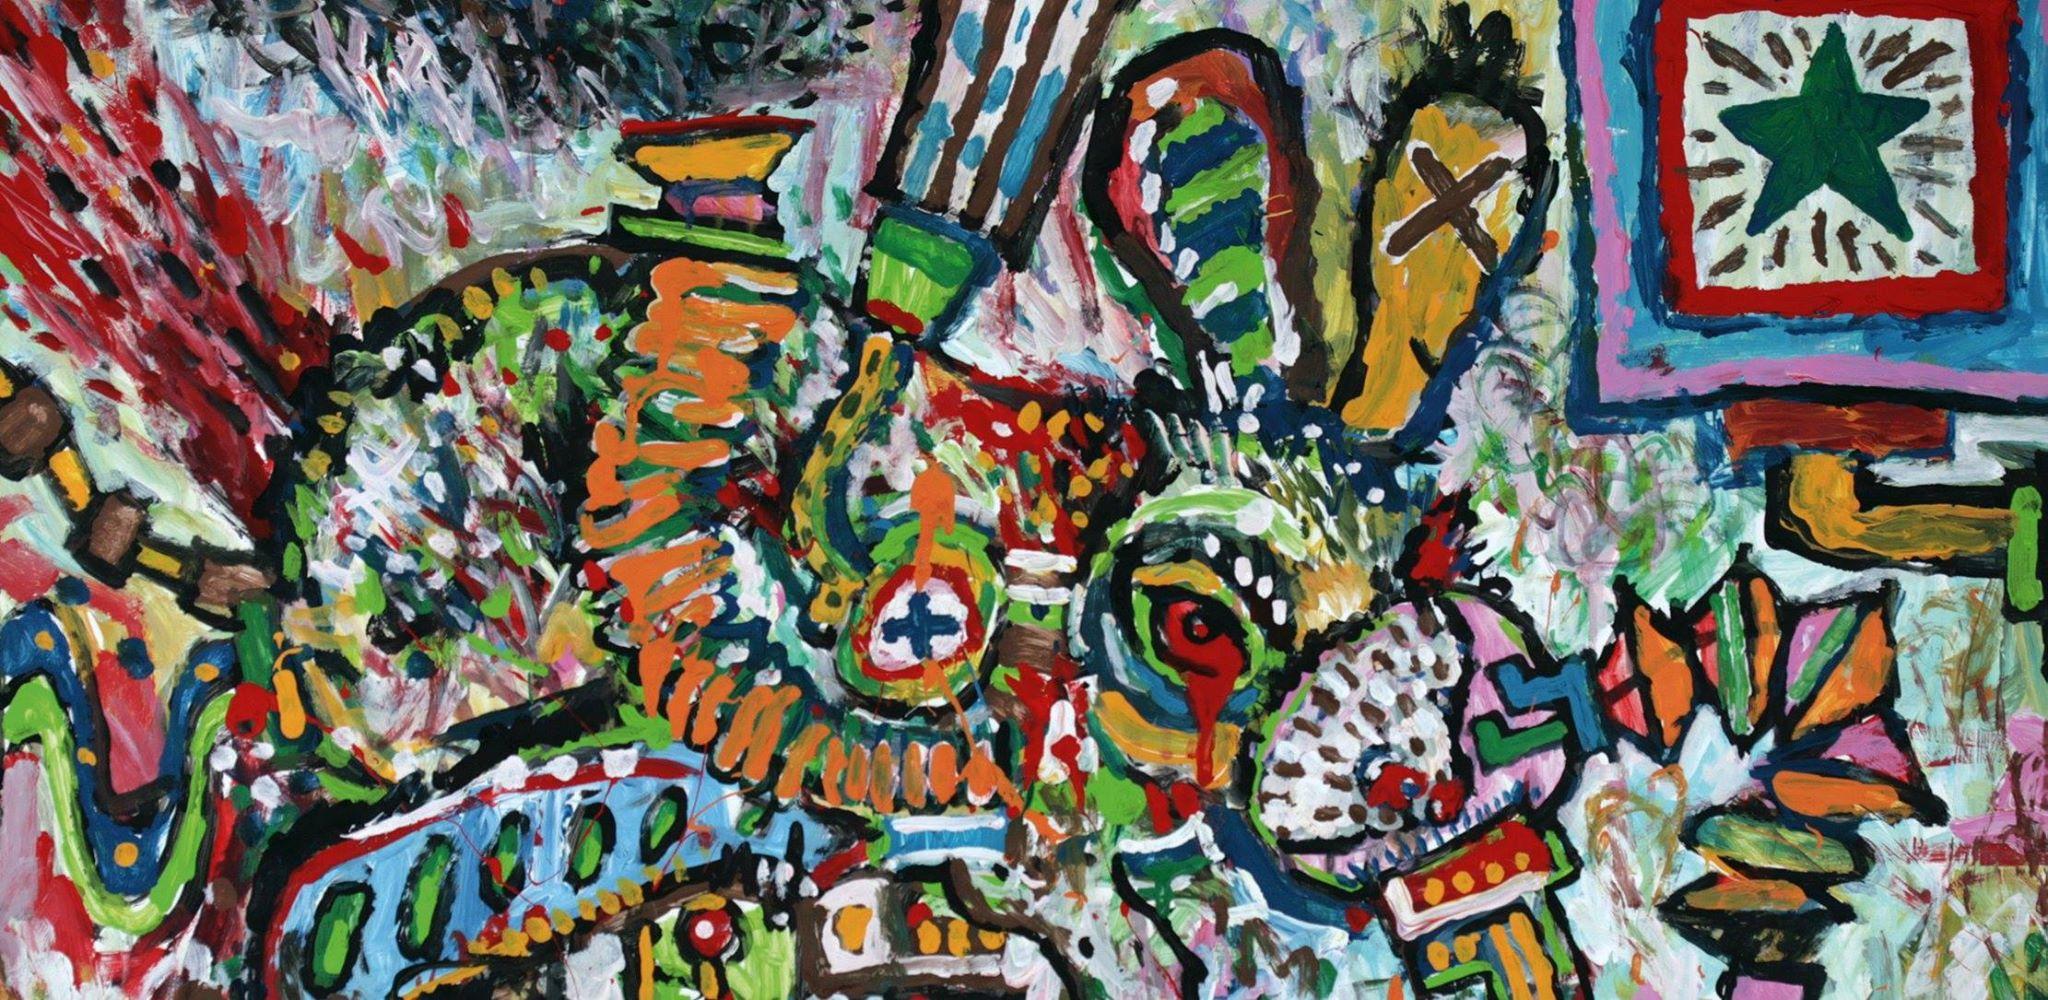 Brave lapin, Biz'art-Biz'art 2015